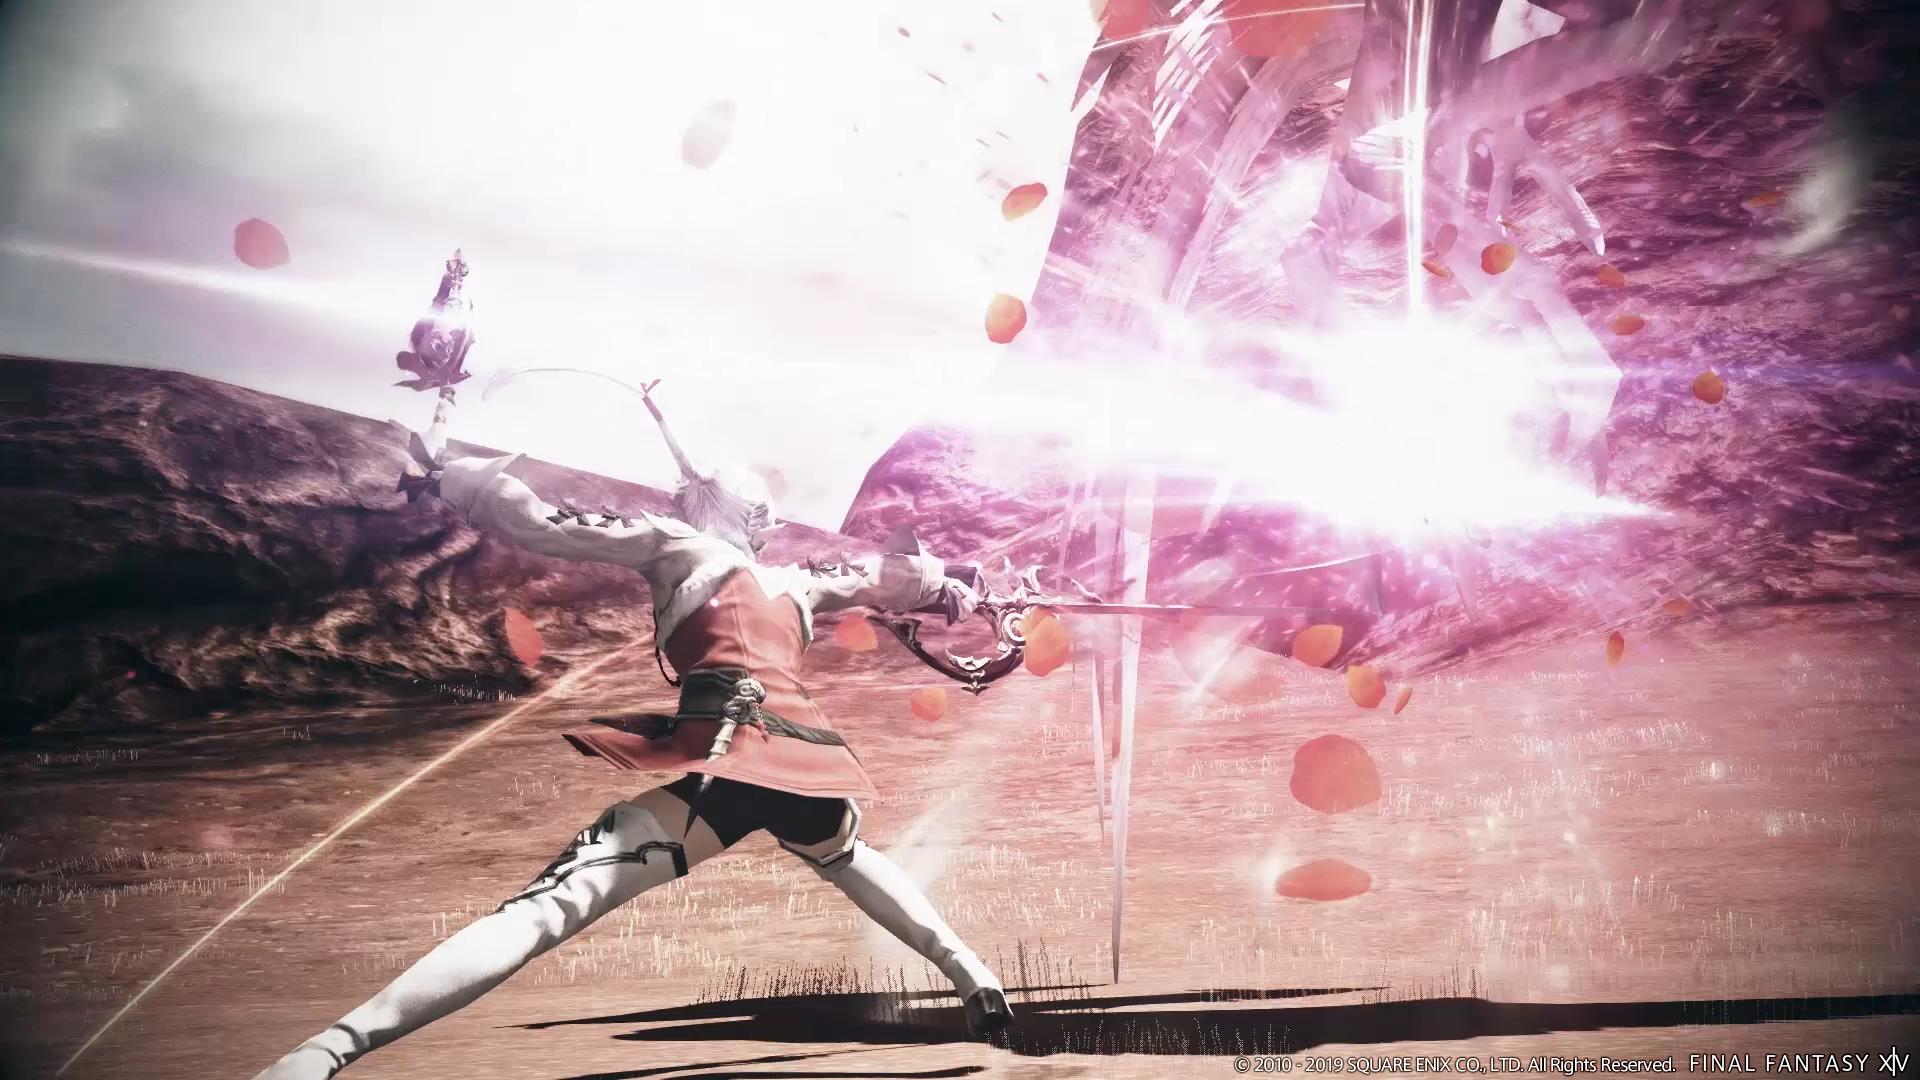 Rückblick - Final Fantasy XIV: Schattenbringer 3